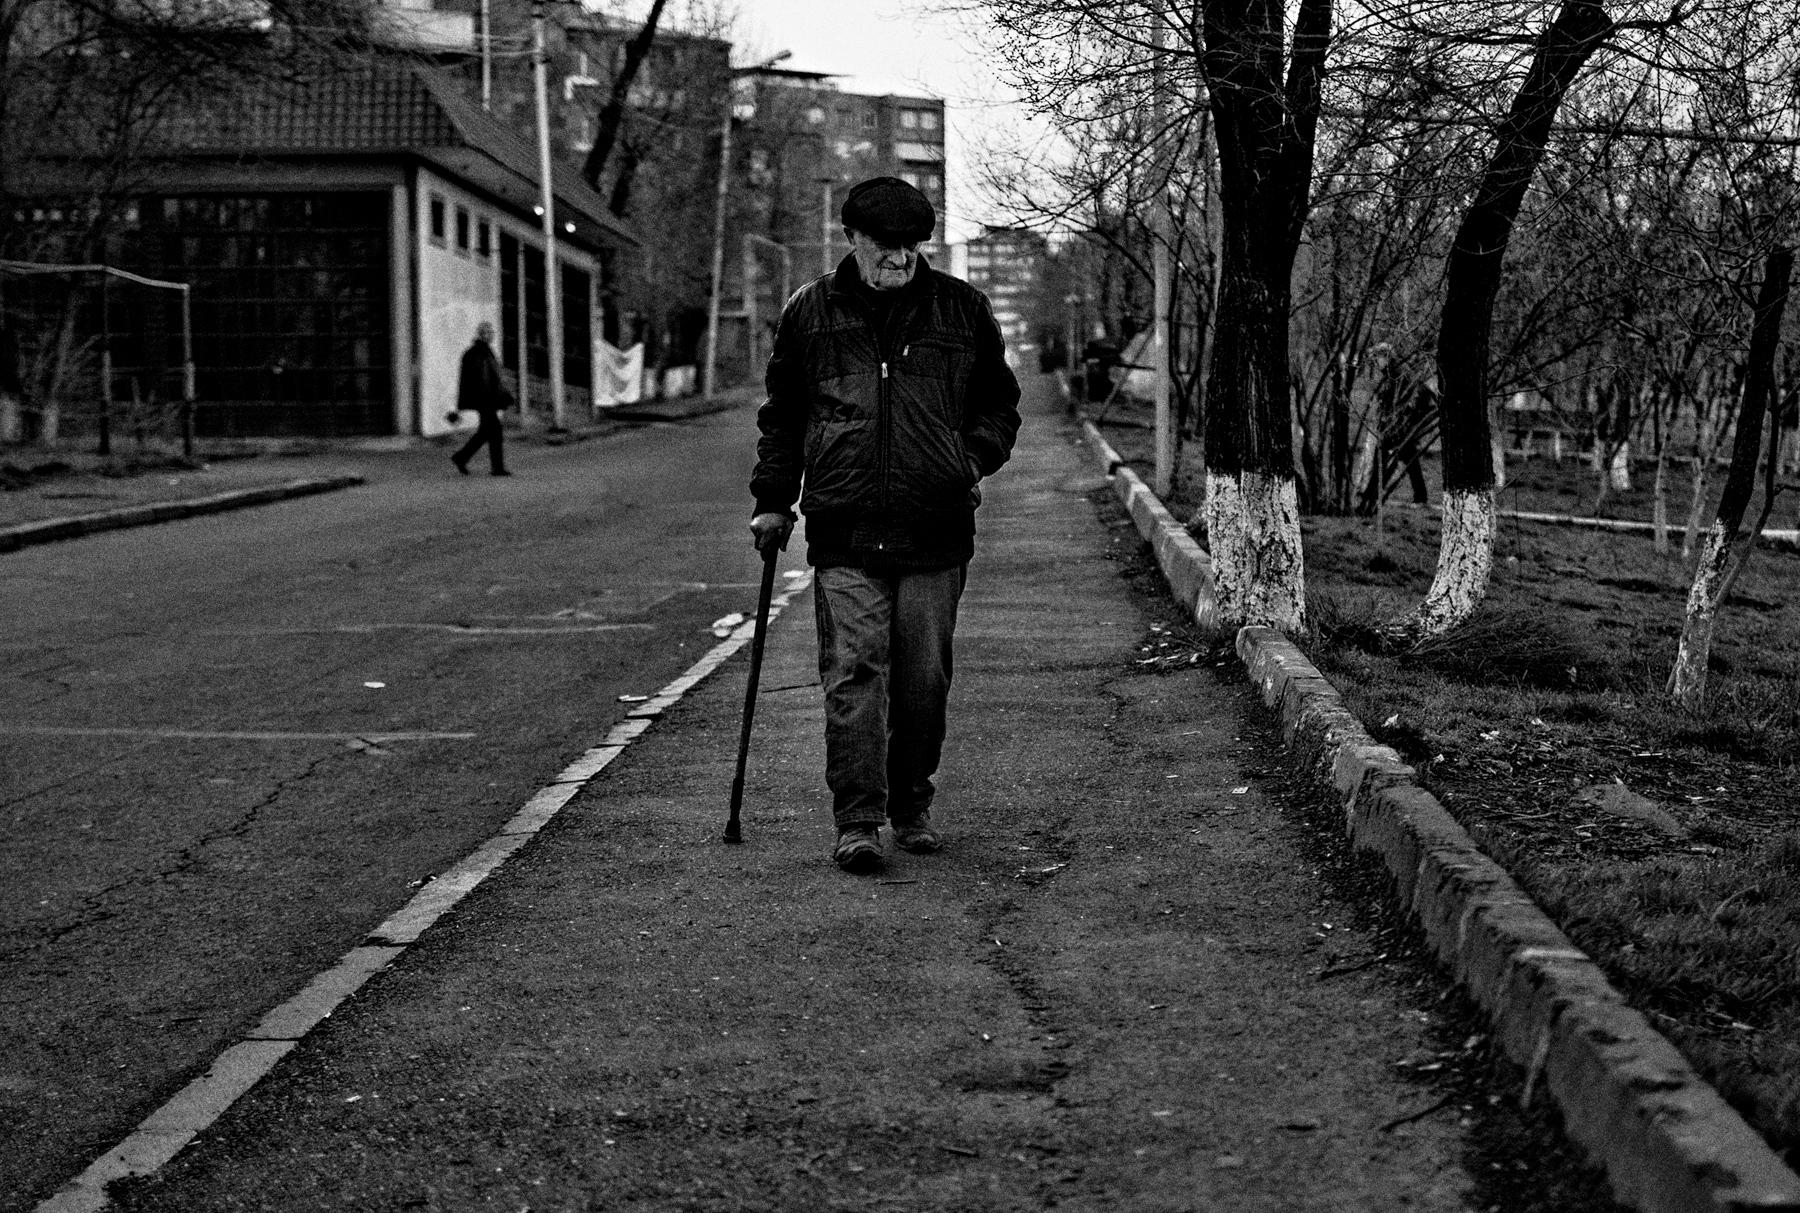 An early morning stroller on the Moldovakan Street in the Capital City of Yerevan, Armenia.